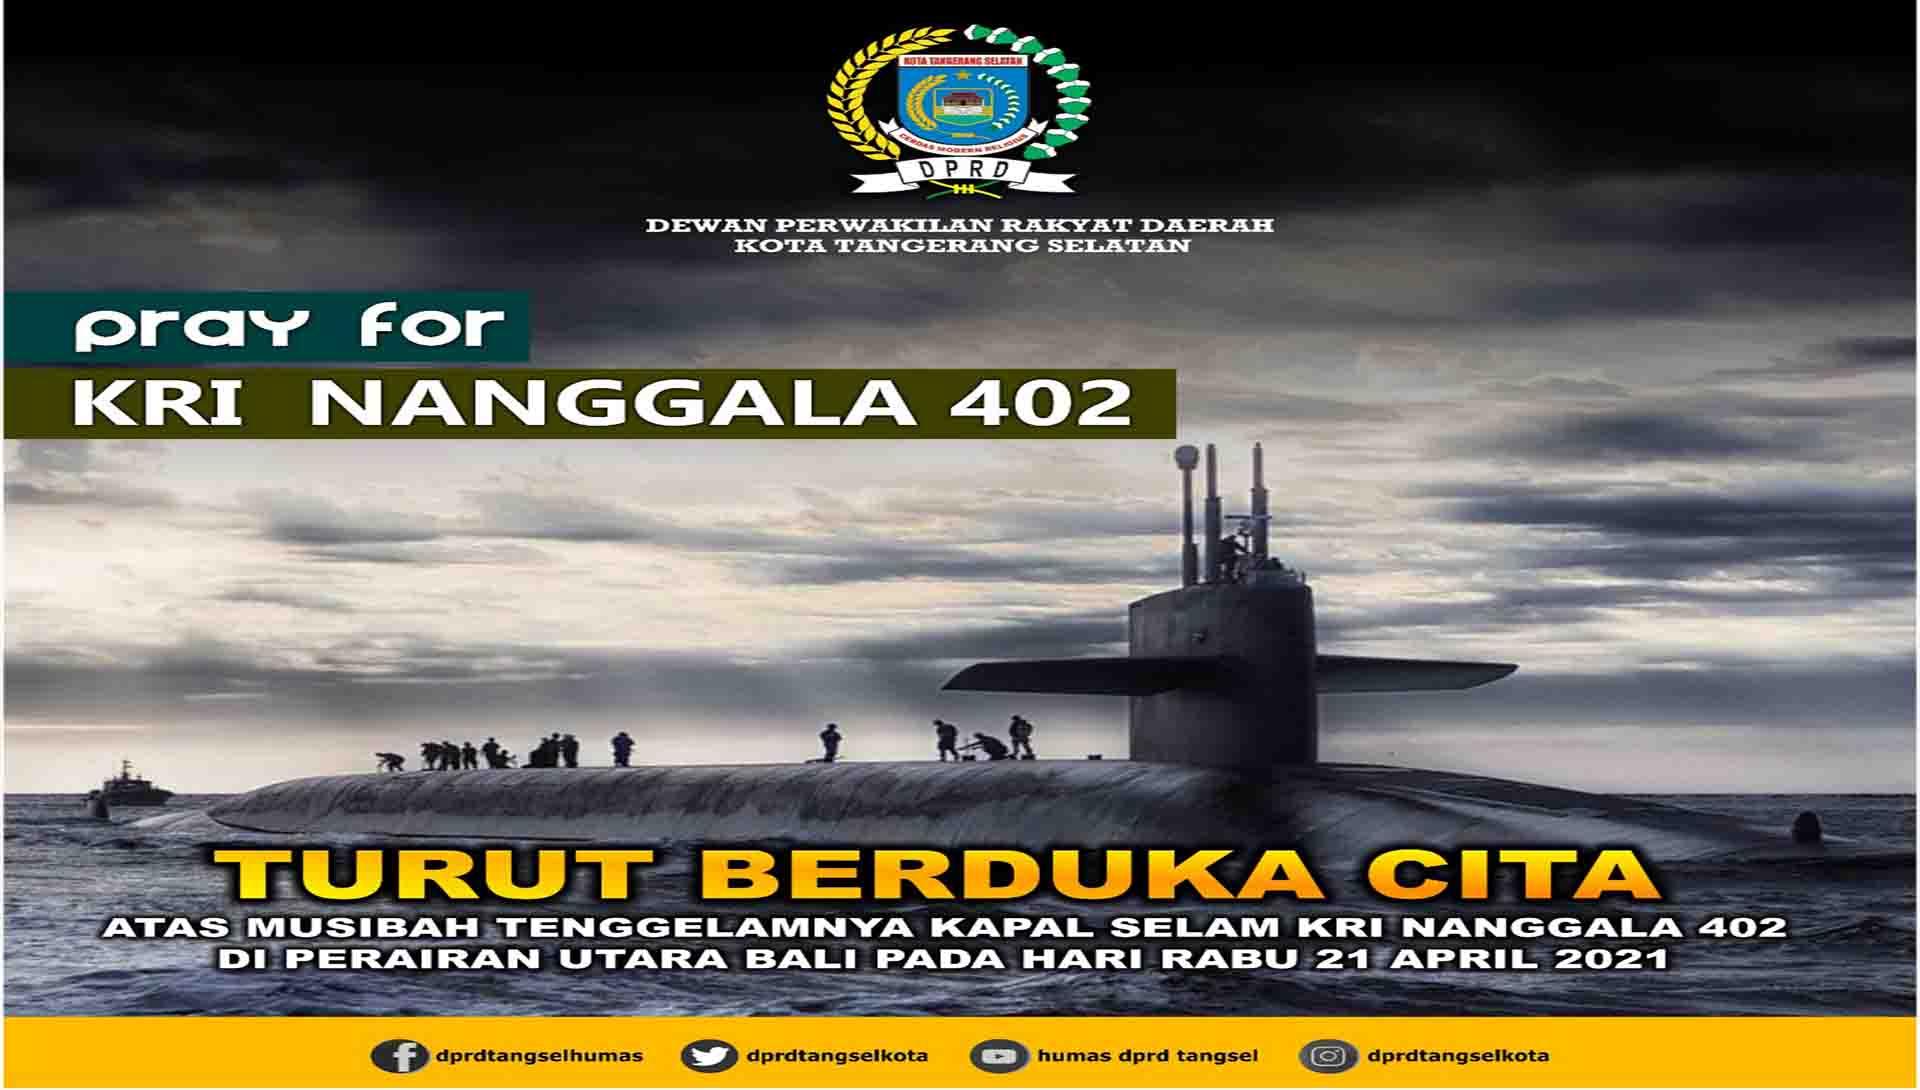 Turut berduka cita musibah tenggelamnya Kapal Selam KRI Nanggala 402